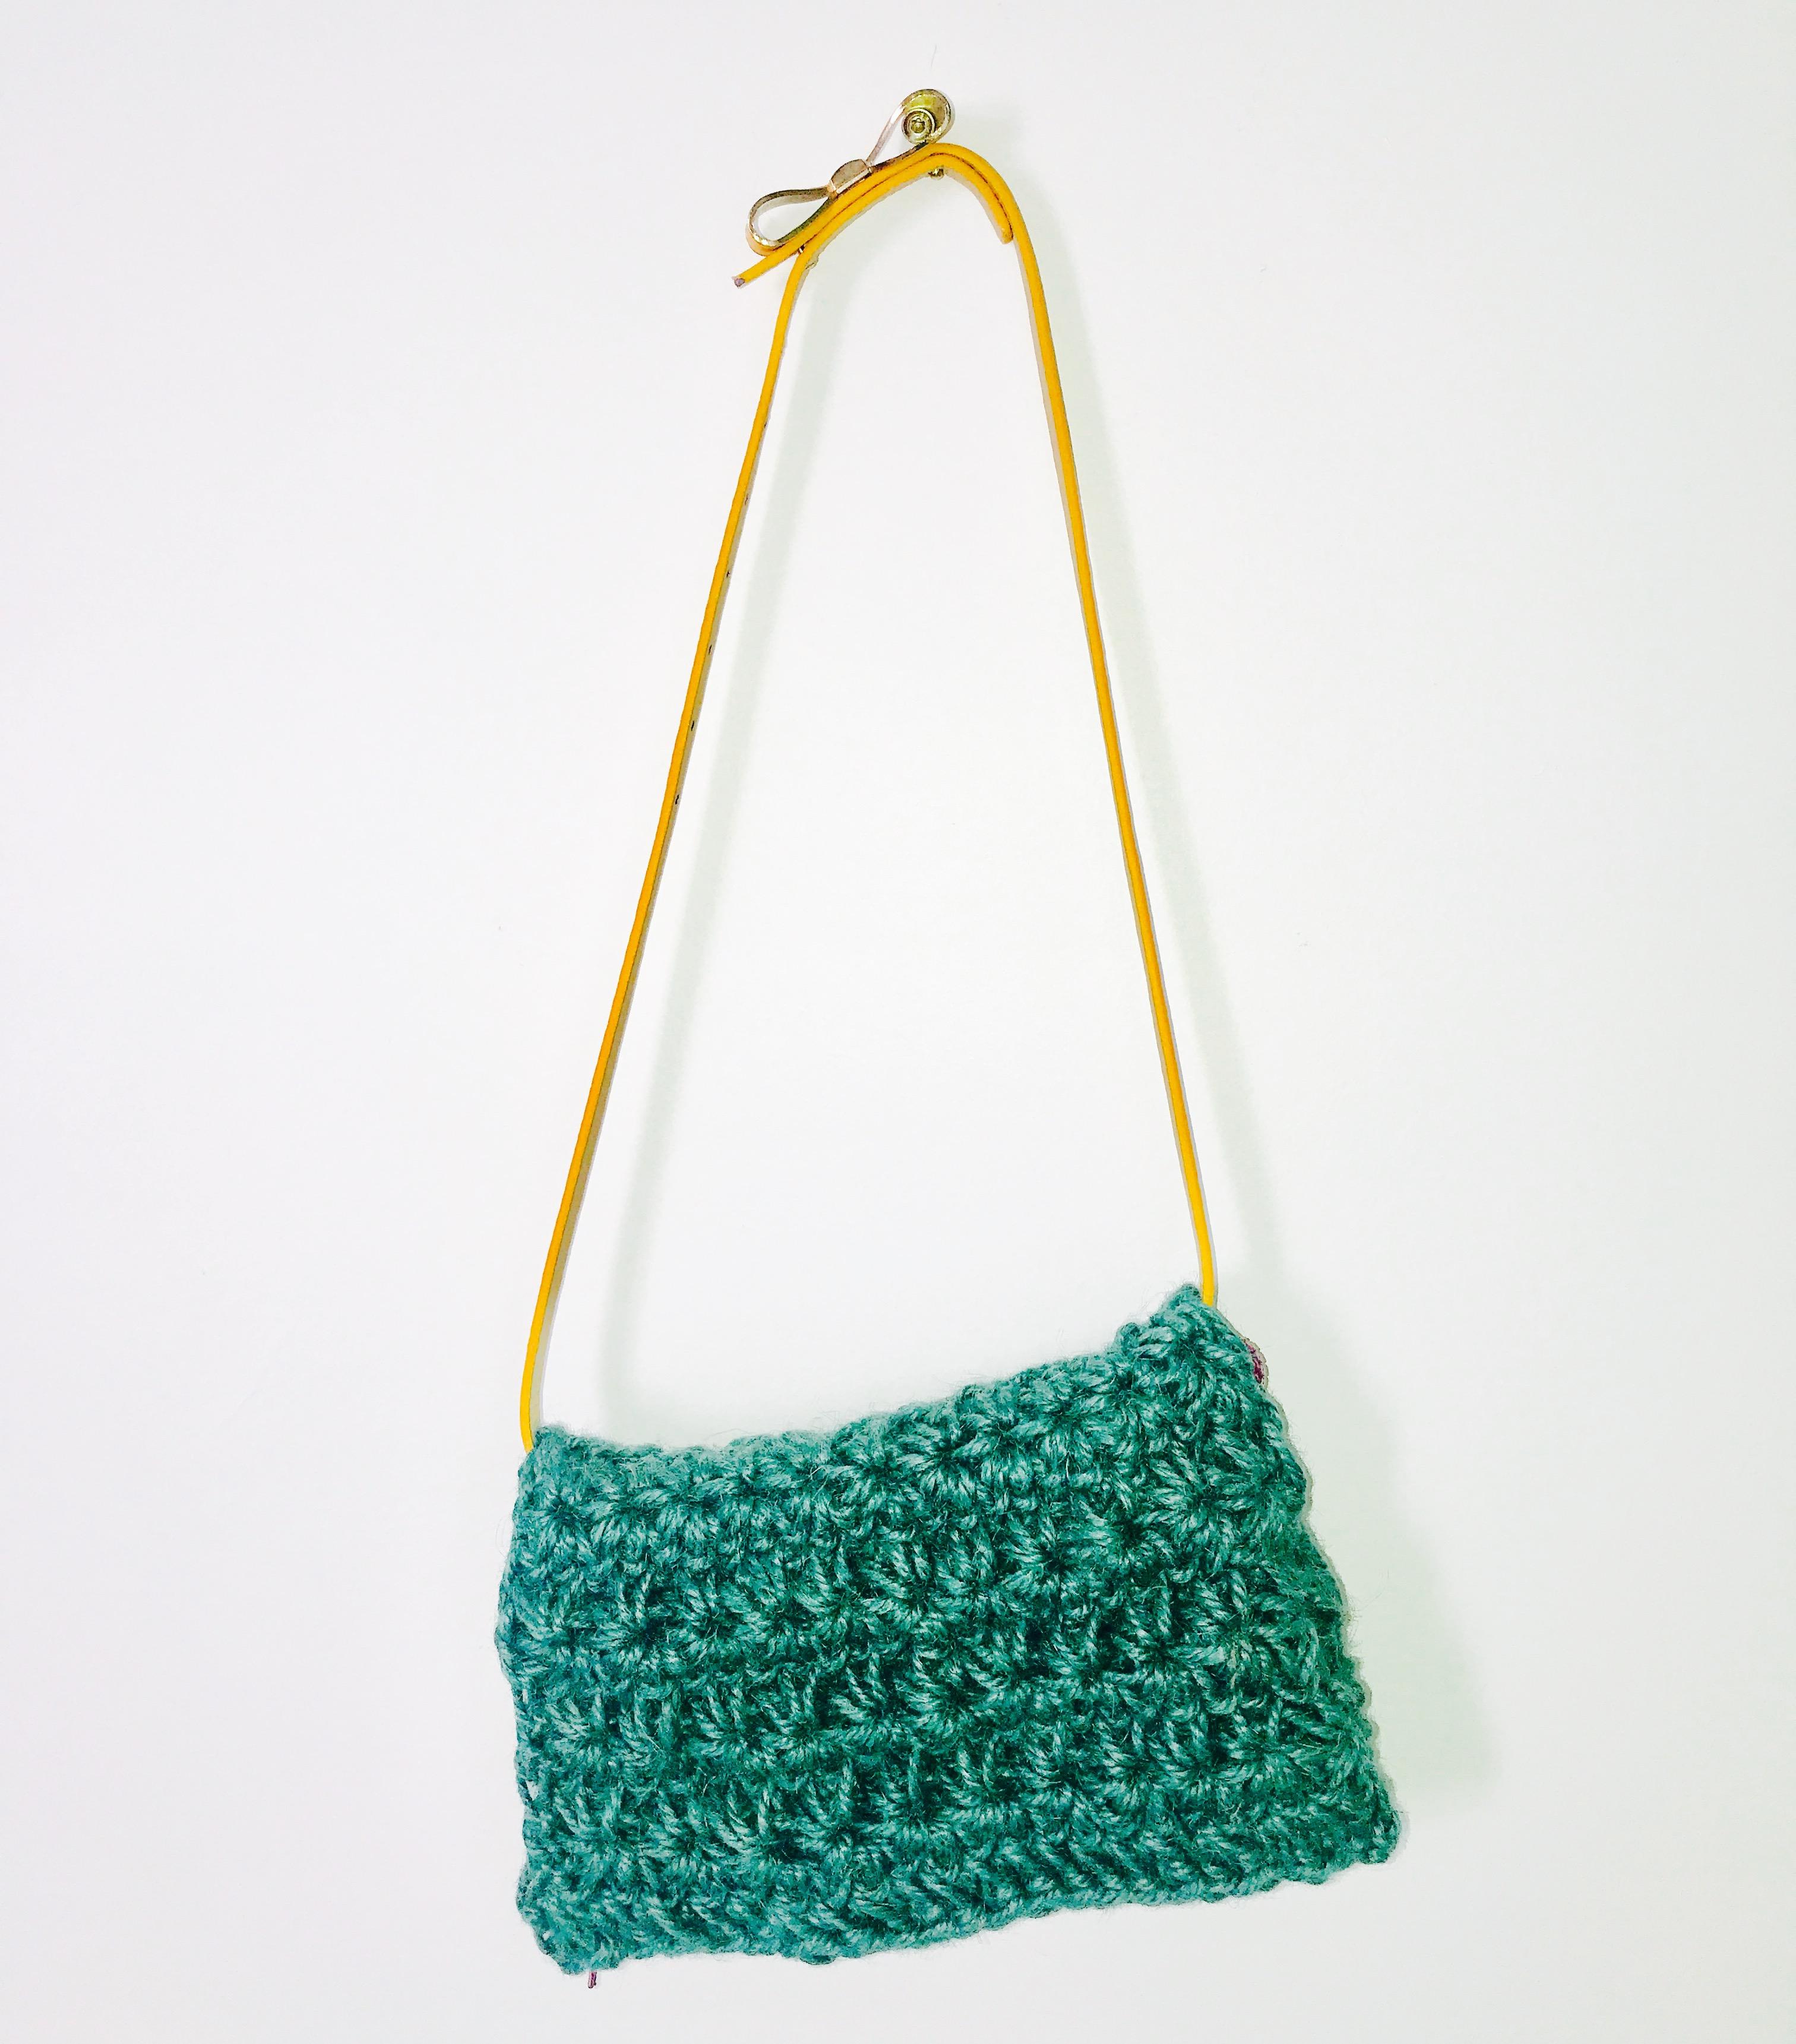 Twine handbag crochet after myfixituplife